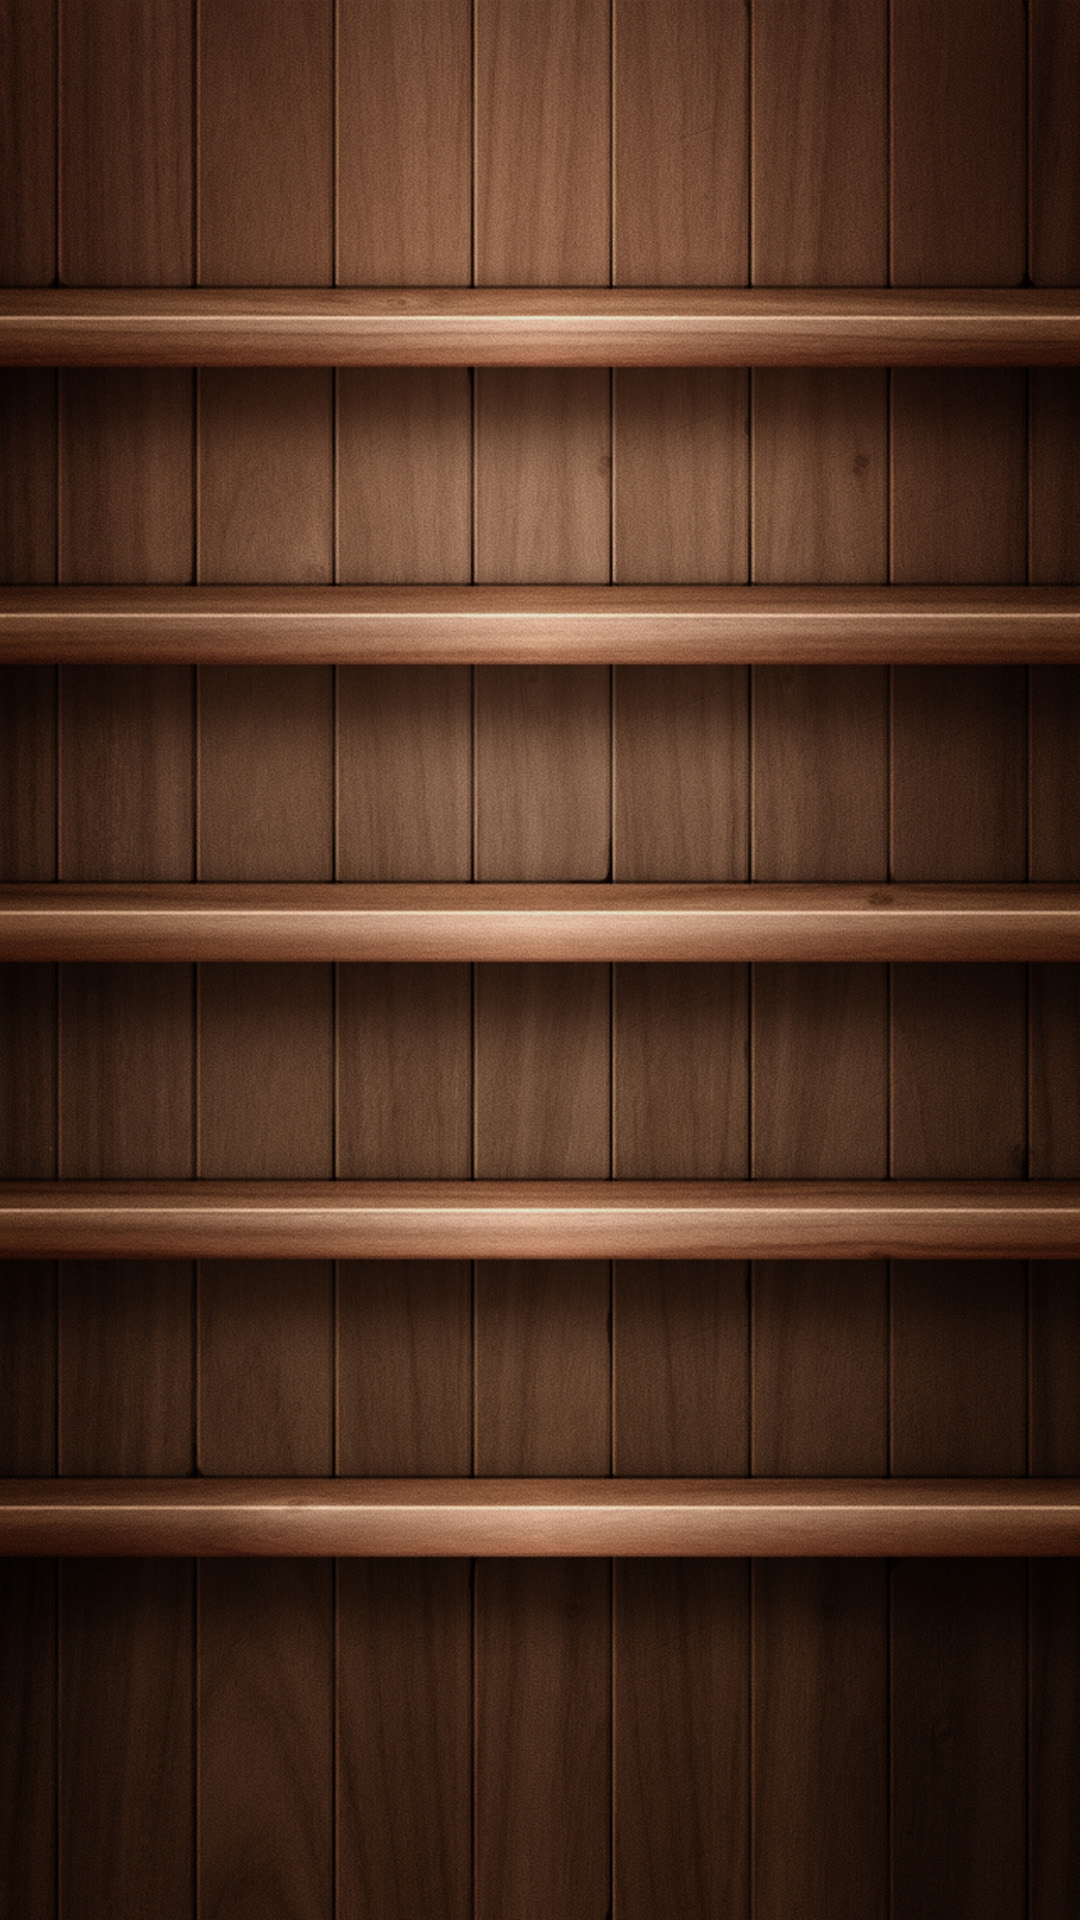 Brown Wood Clean Shelf iPhone 6 Plus HD Wallpaper iPhone 66S7 1080x1920